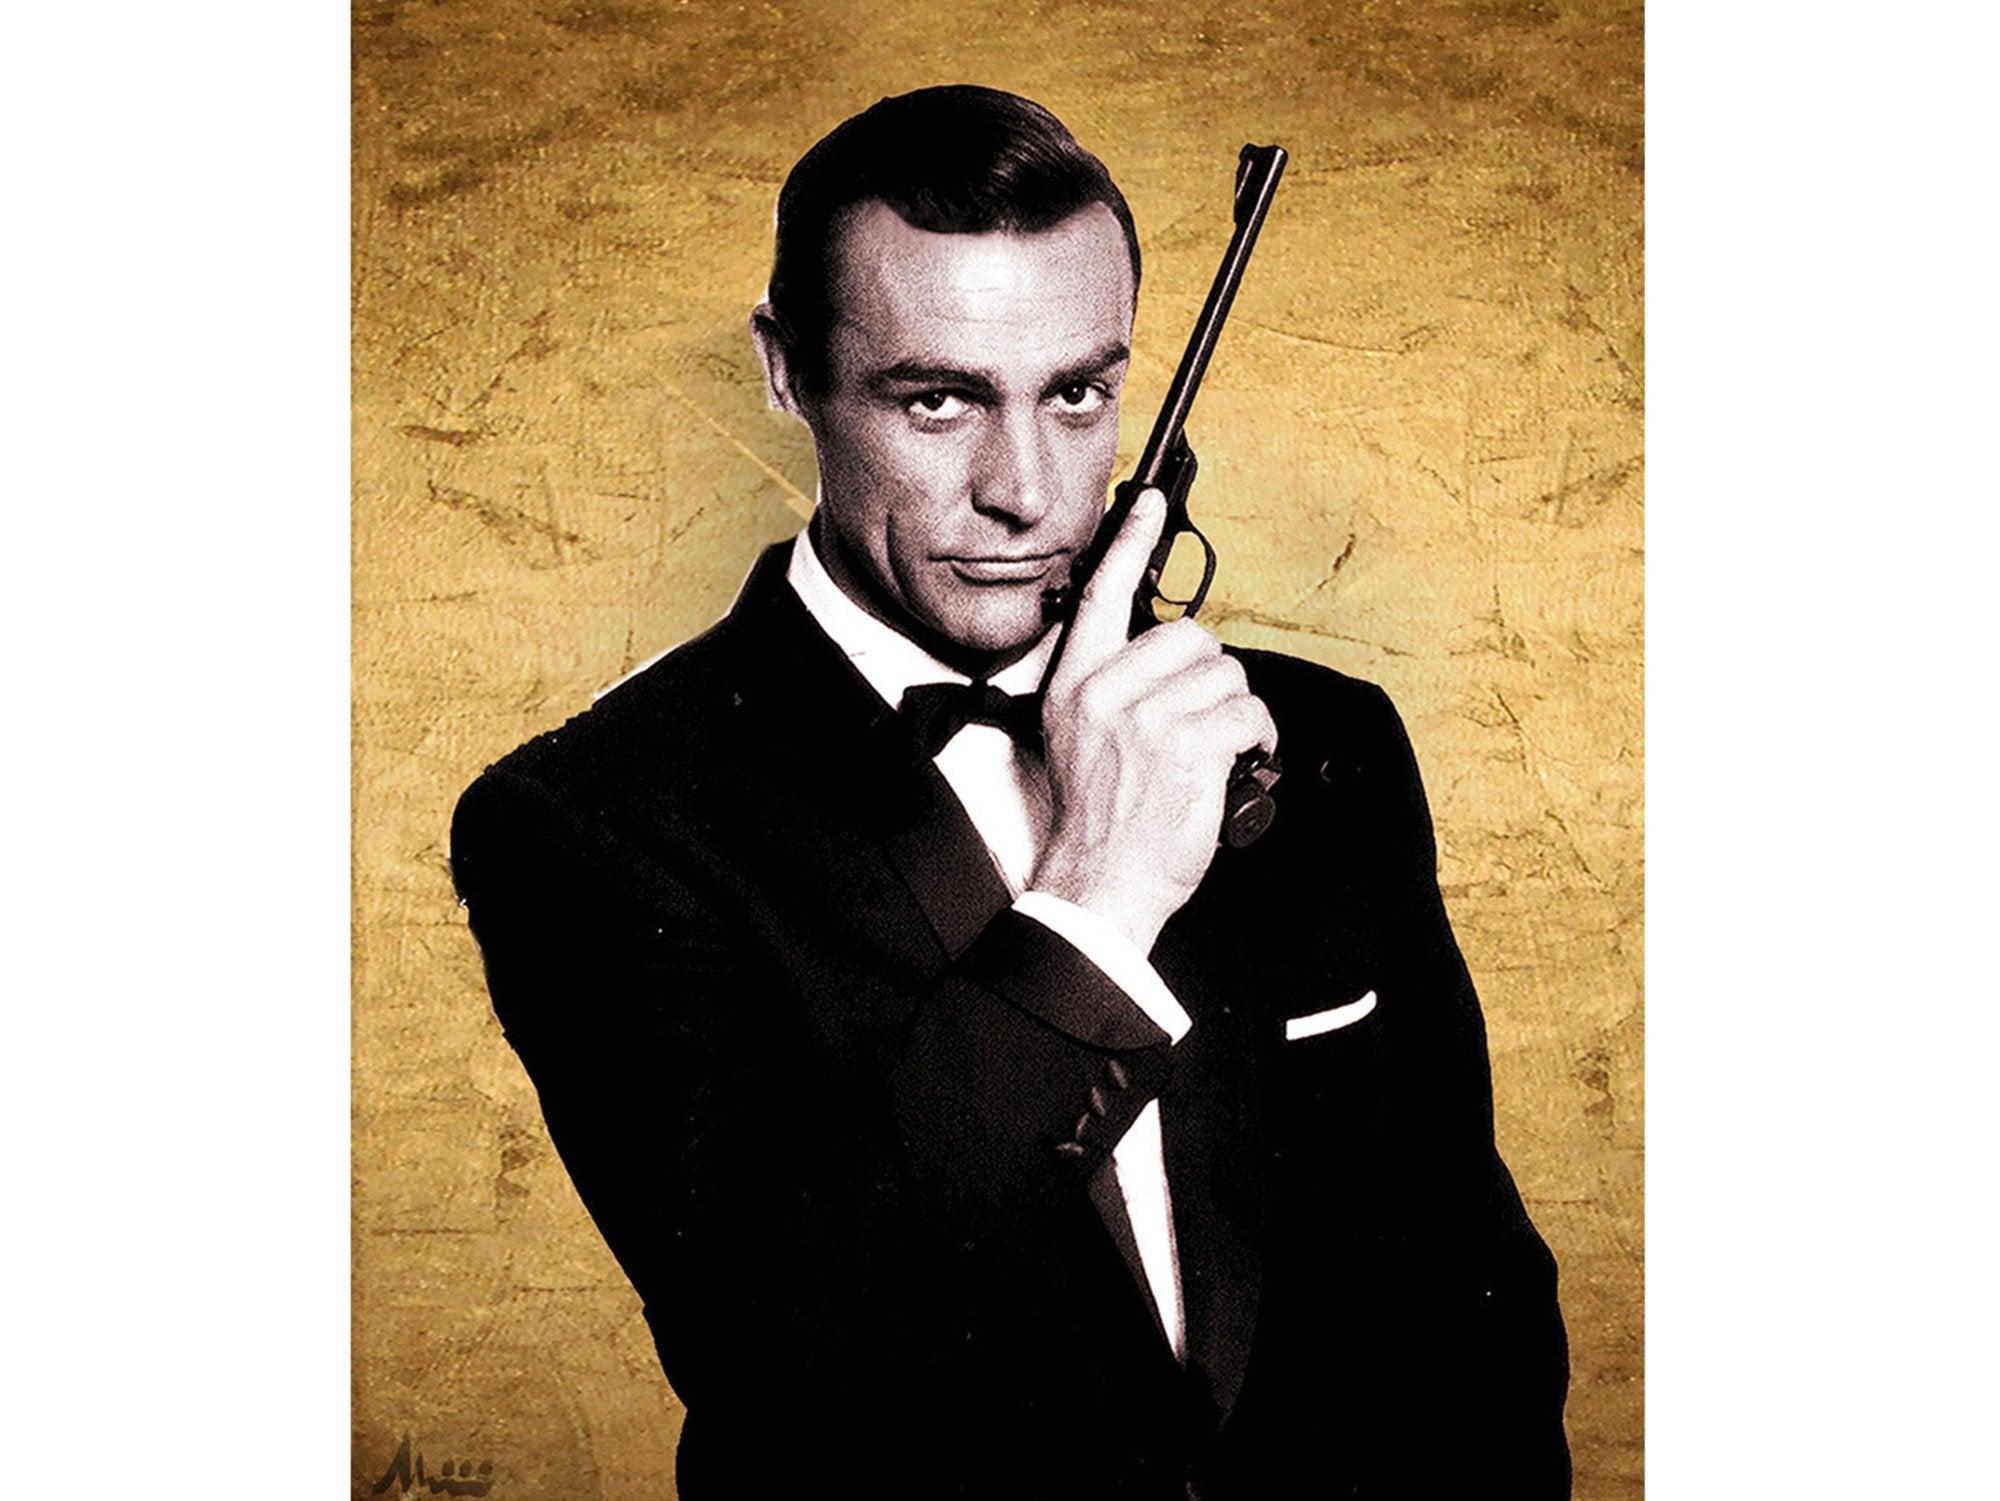 Sean Connery as James Bond - Albin Albinini - Another Dandy